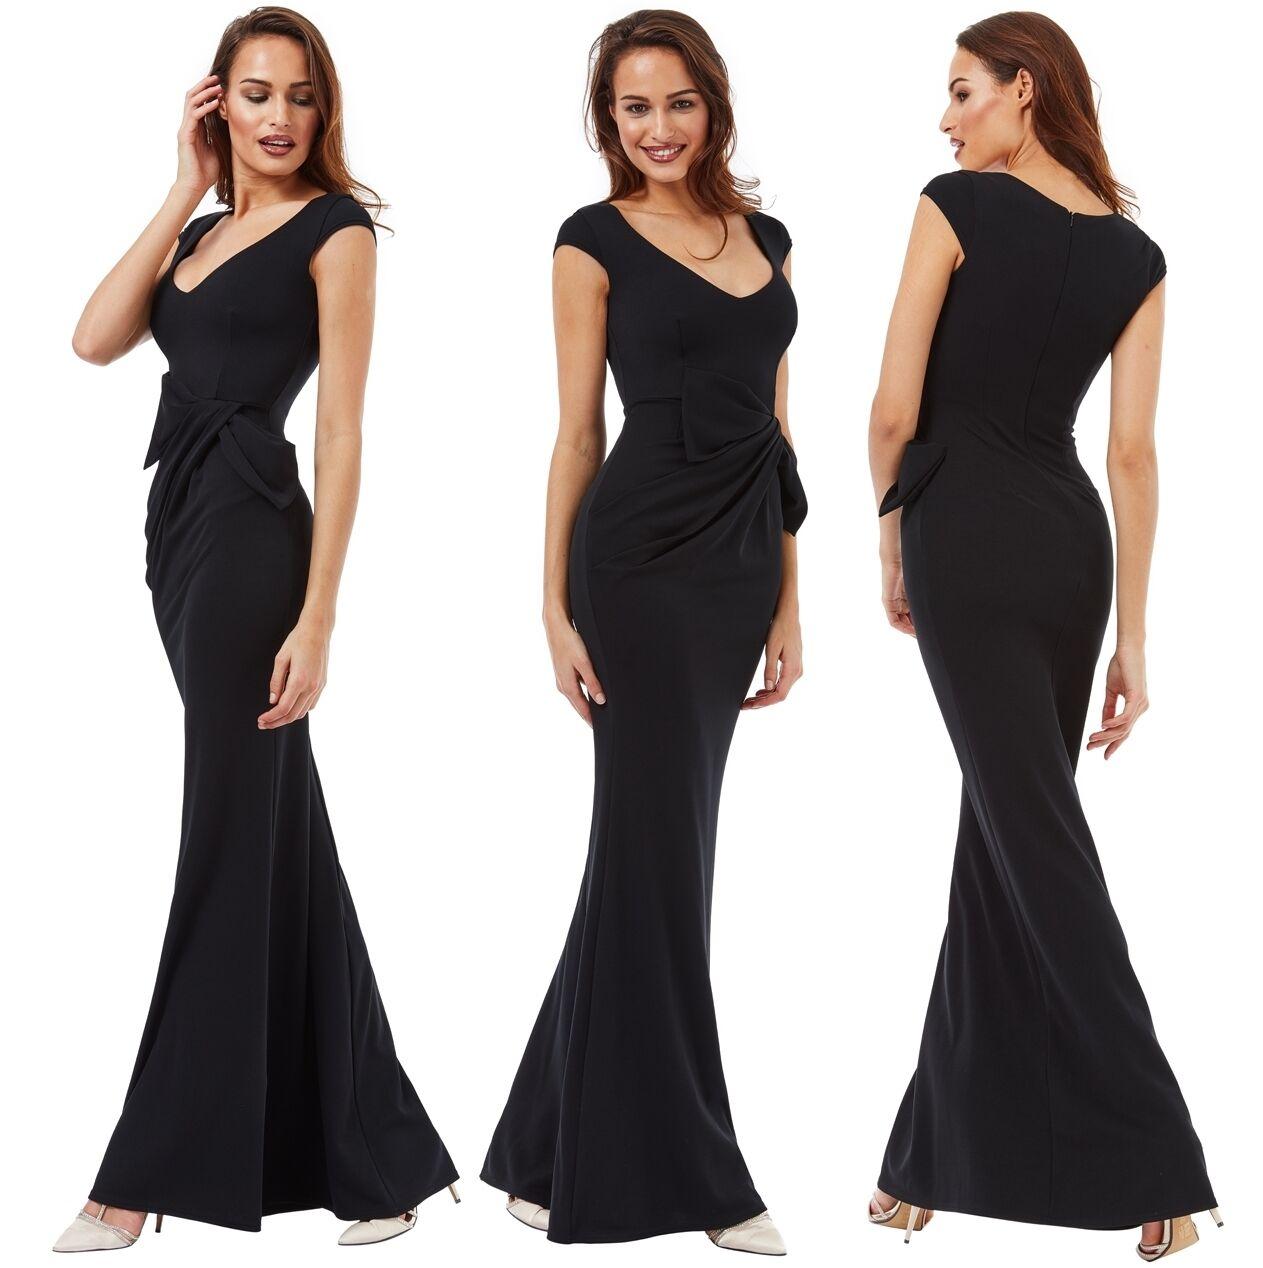 Goddiva Long schwarz Drape Bow Sleeveless Evening Prom Party Maxi Dress Bridesmaid